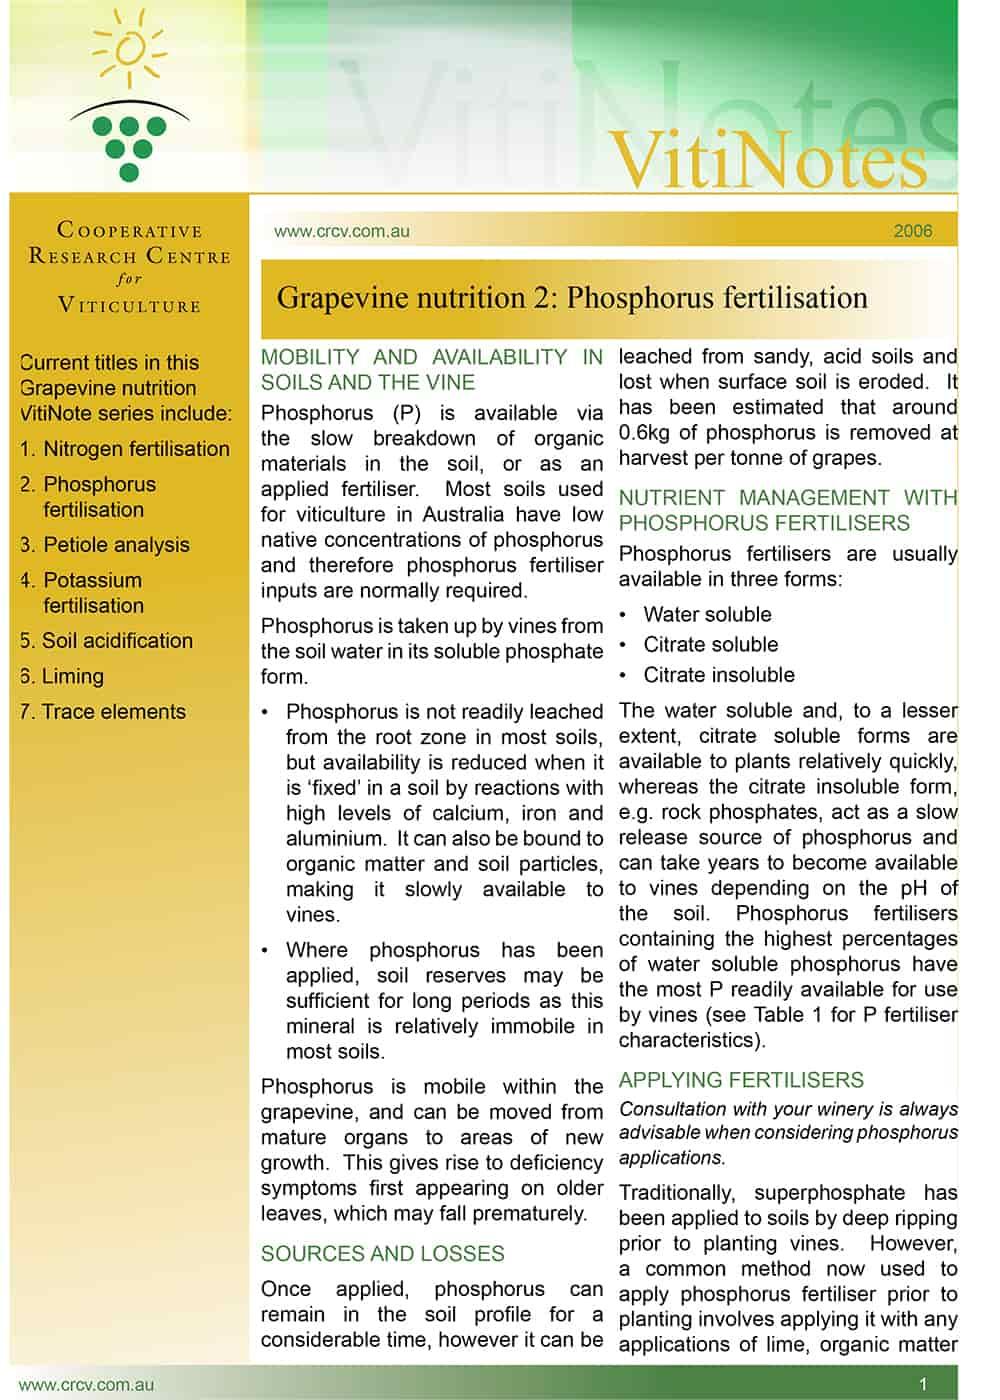 Grapevine nutrition 2: Phosphorus fertilisation